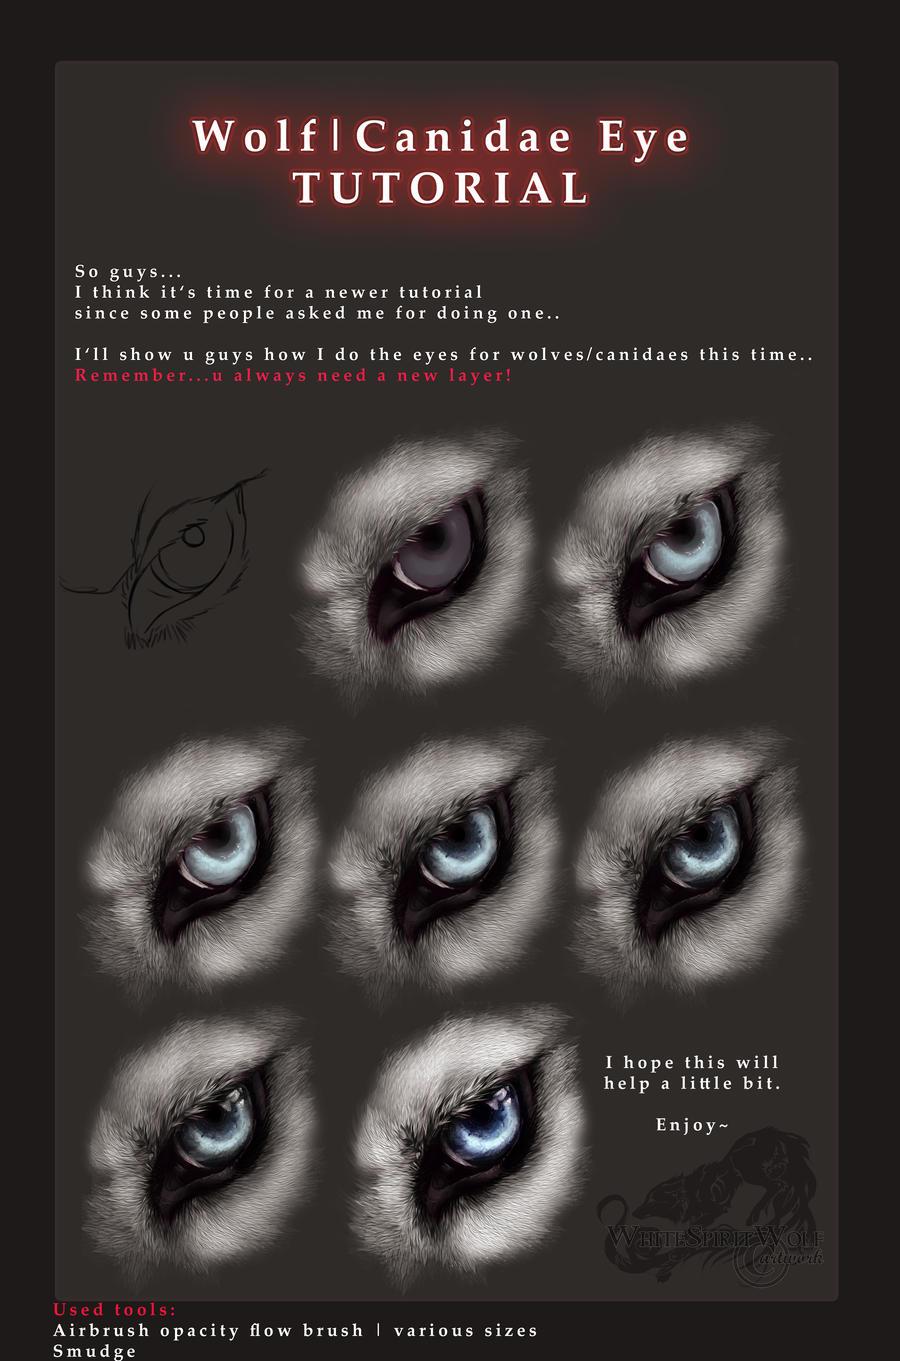 http://fc03.deviantart.net/fs71/i/2013/106/0/d/wolf_canidae_eye_tutorial_by_whitespiritwolf-d61wxcv.jpg